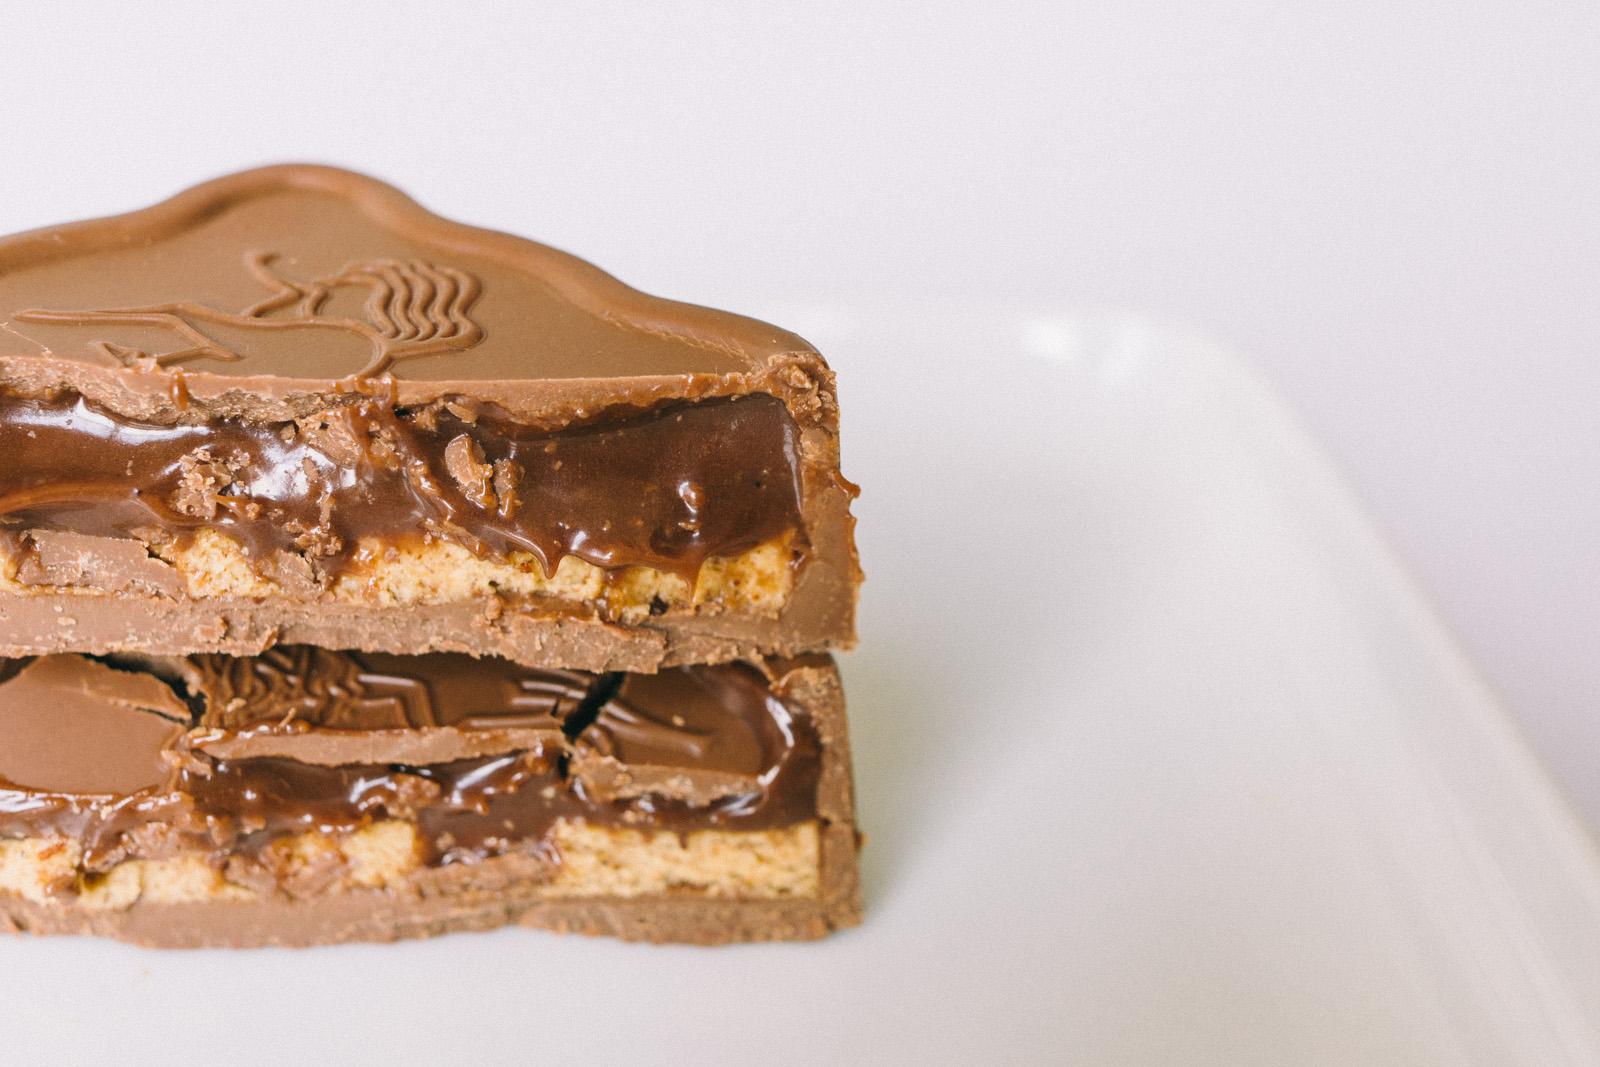 that-food-cray-godiva-chocolate-2013-mid-autumn-festival-mooncakes-37